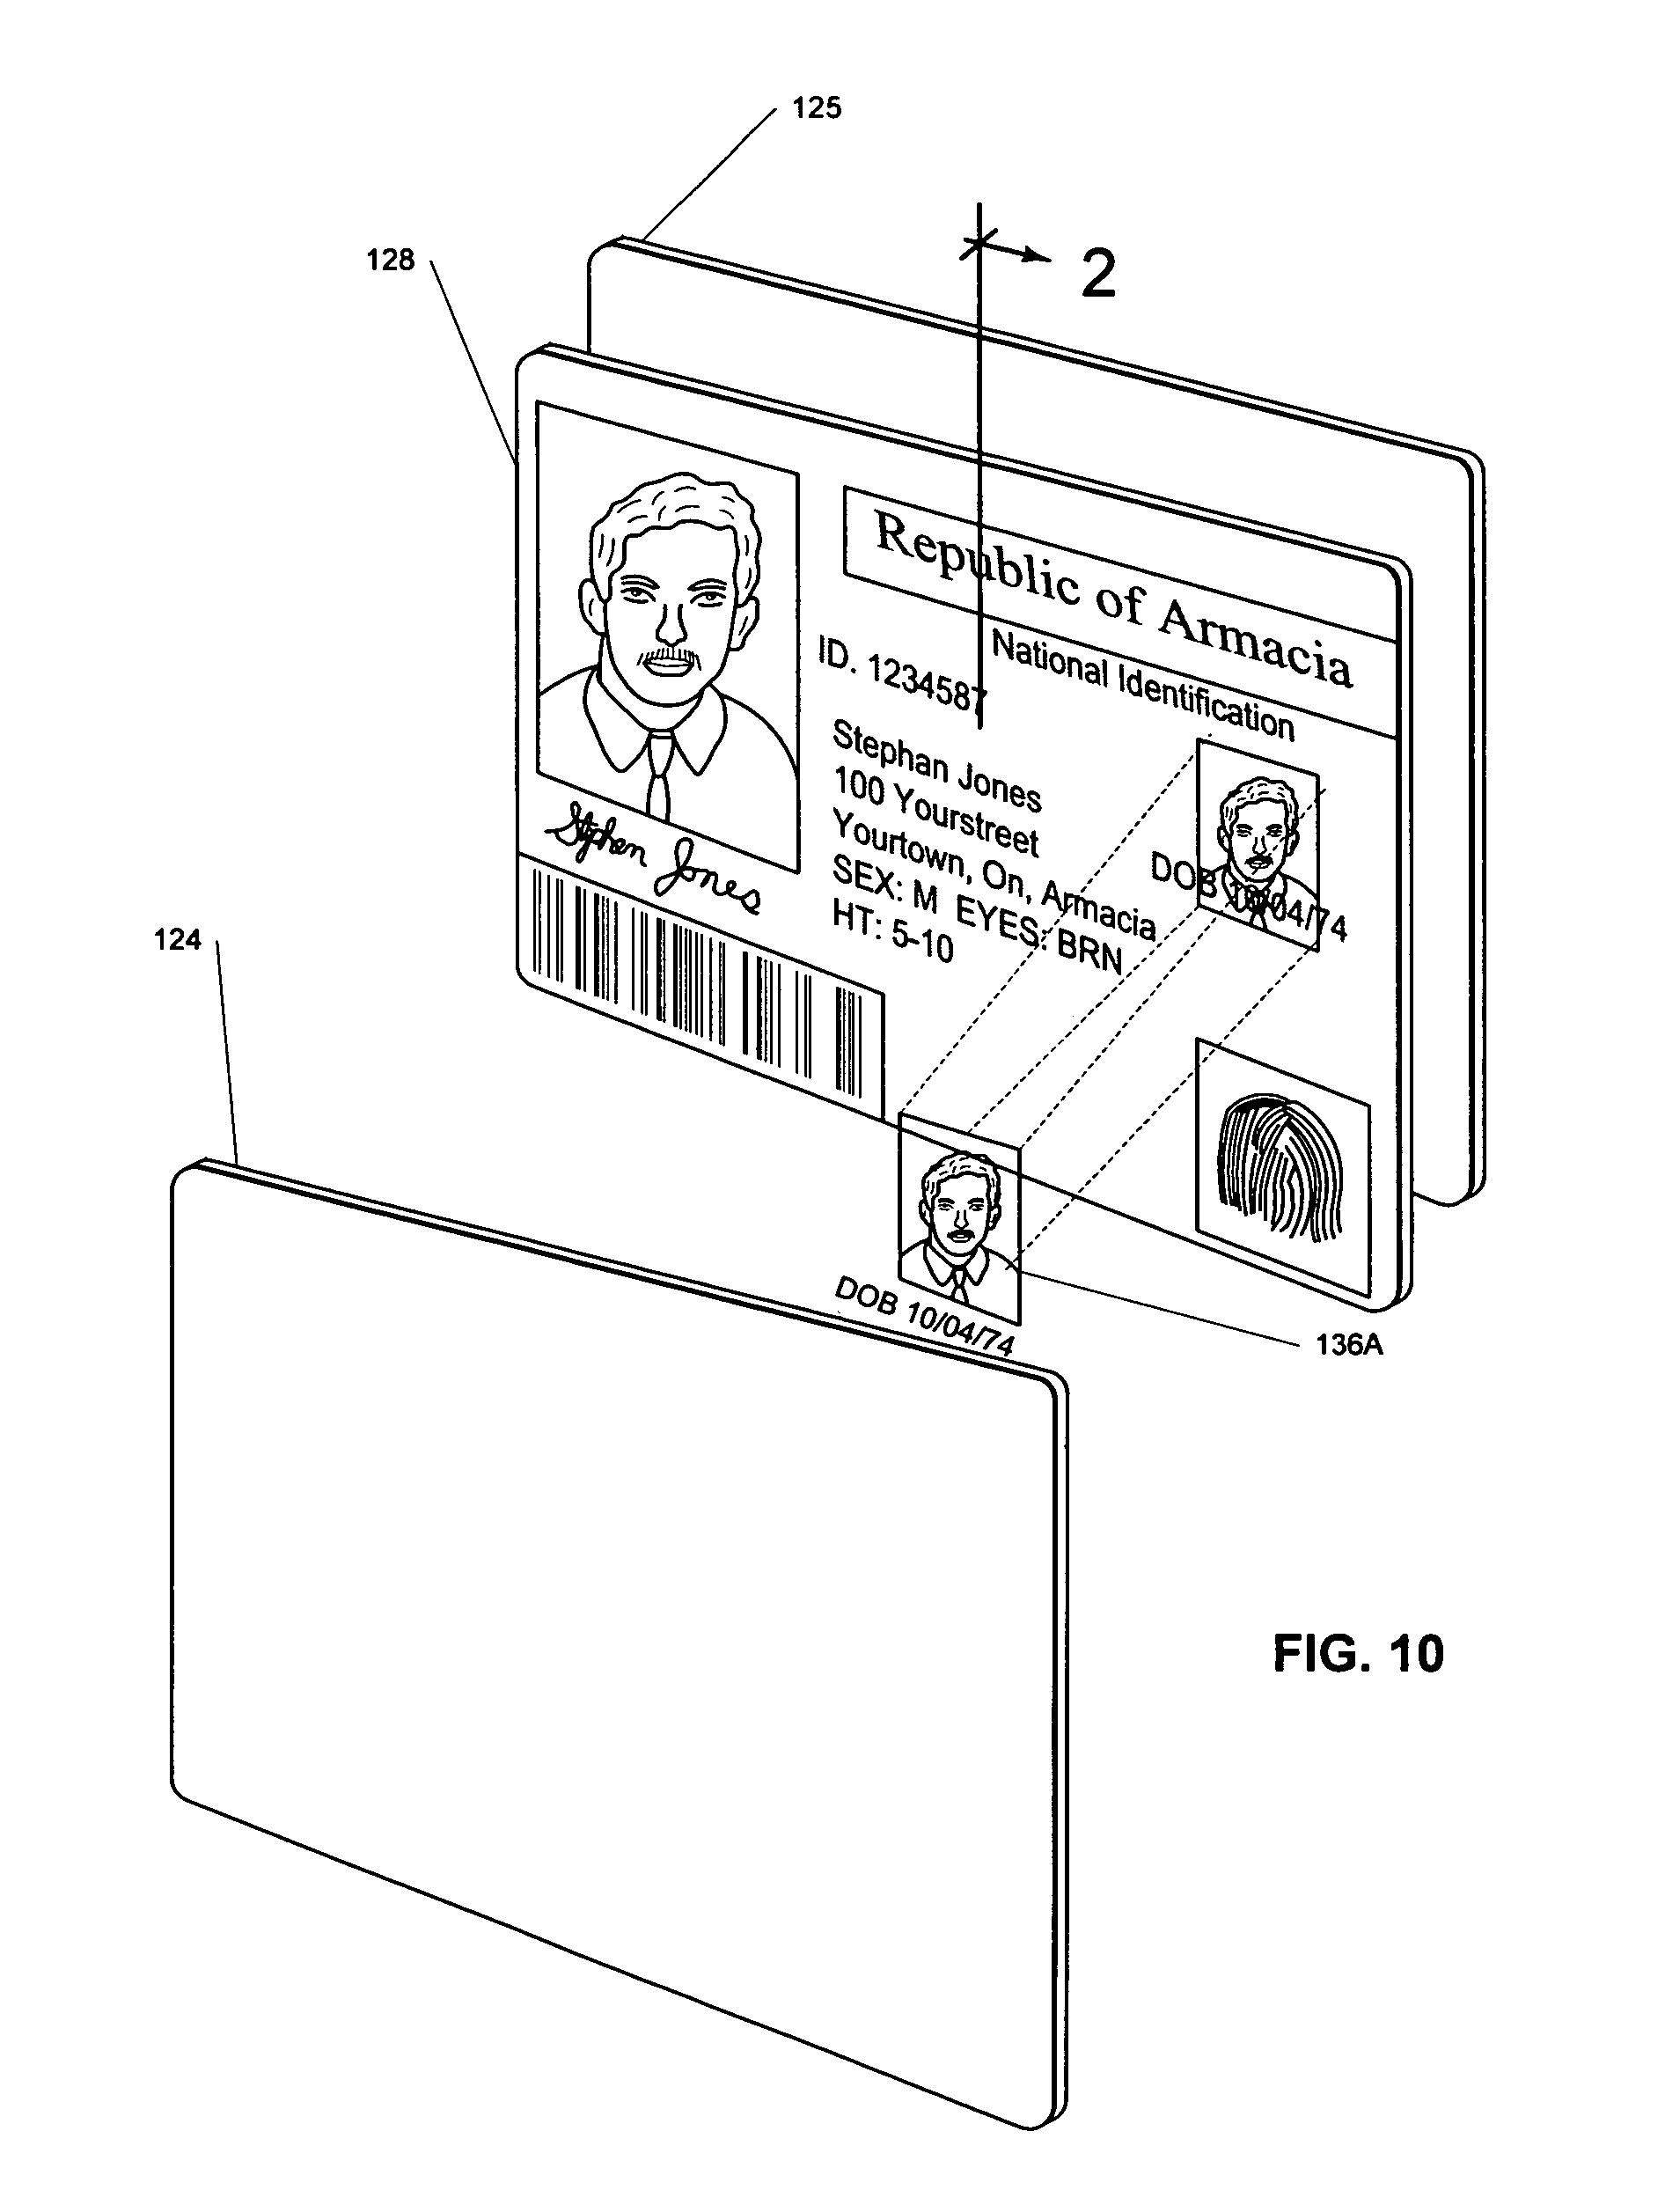 Patent US 7,694,887 B2 on